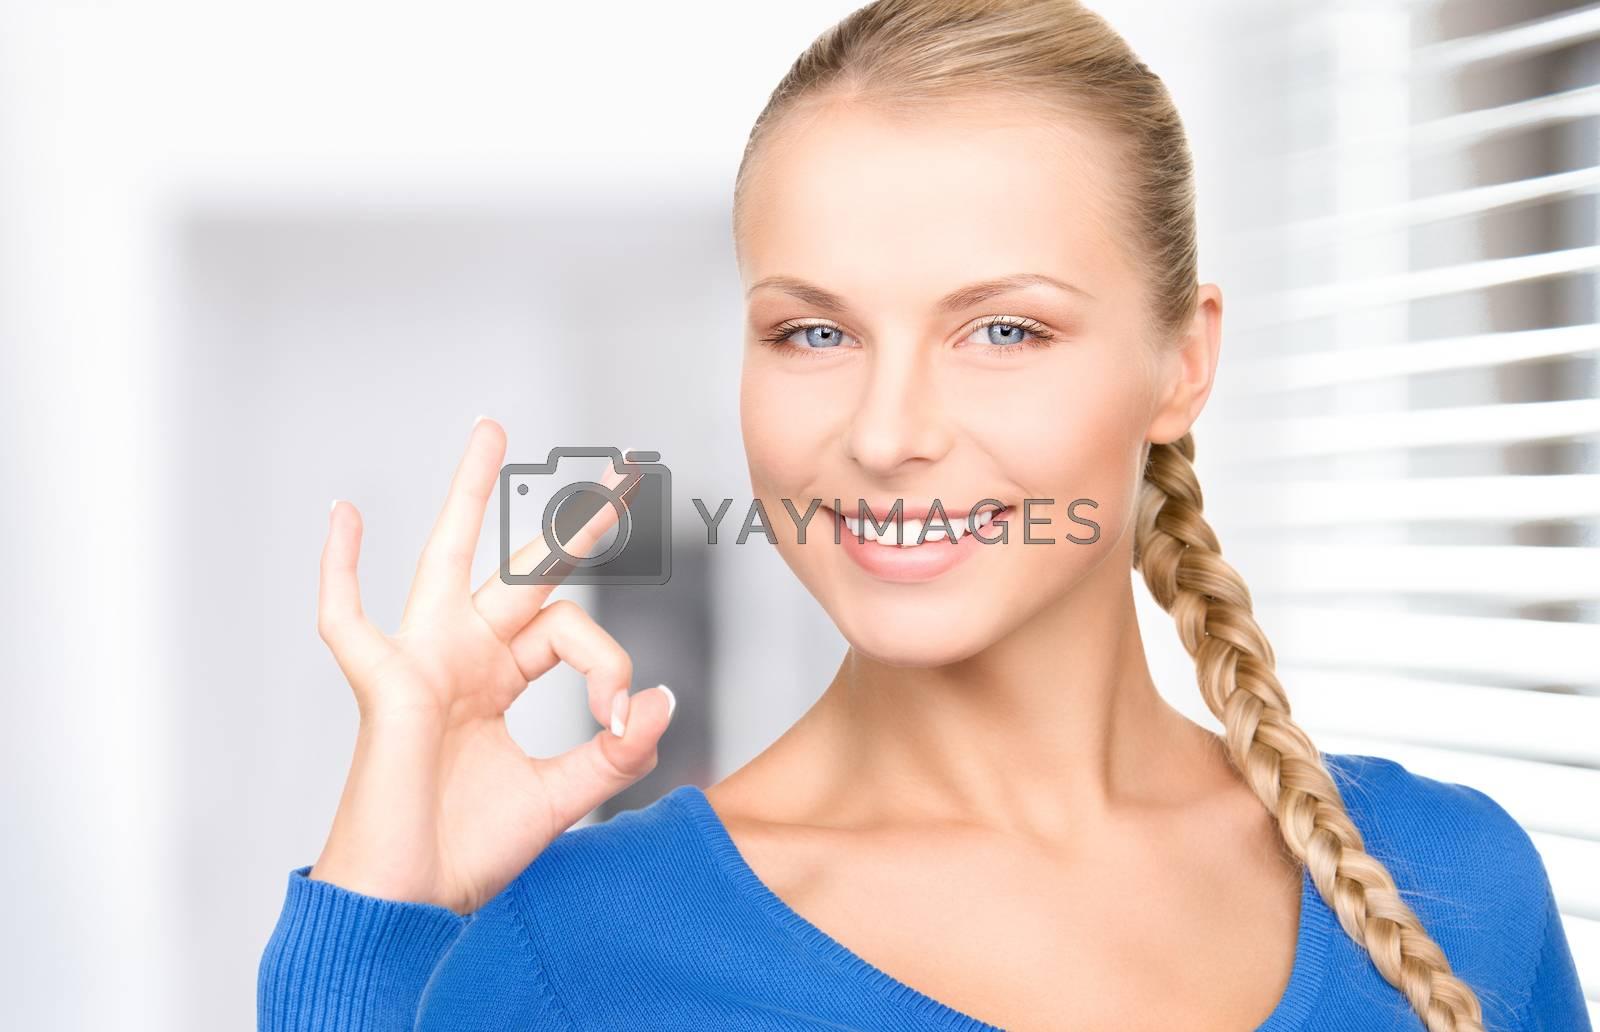 woman showing ok sign by dolgachov